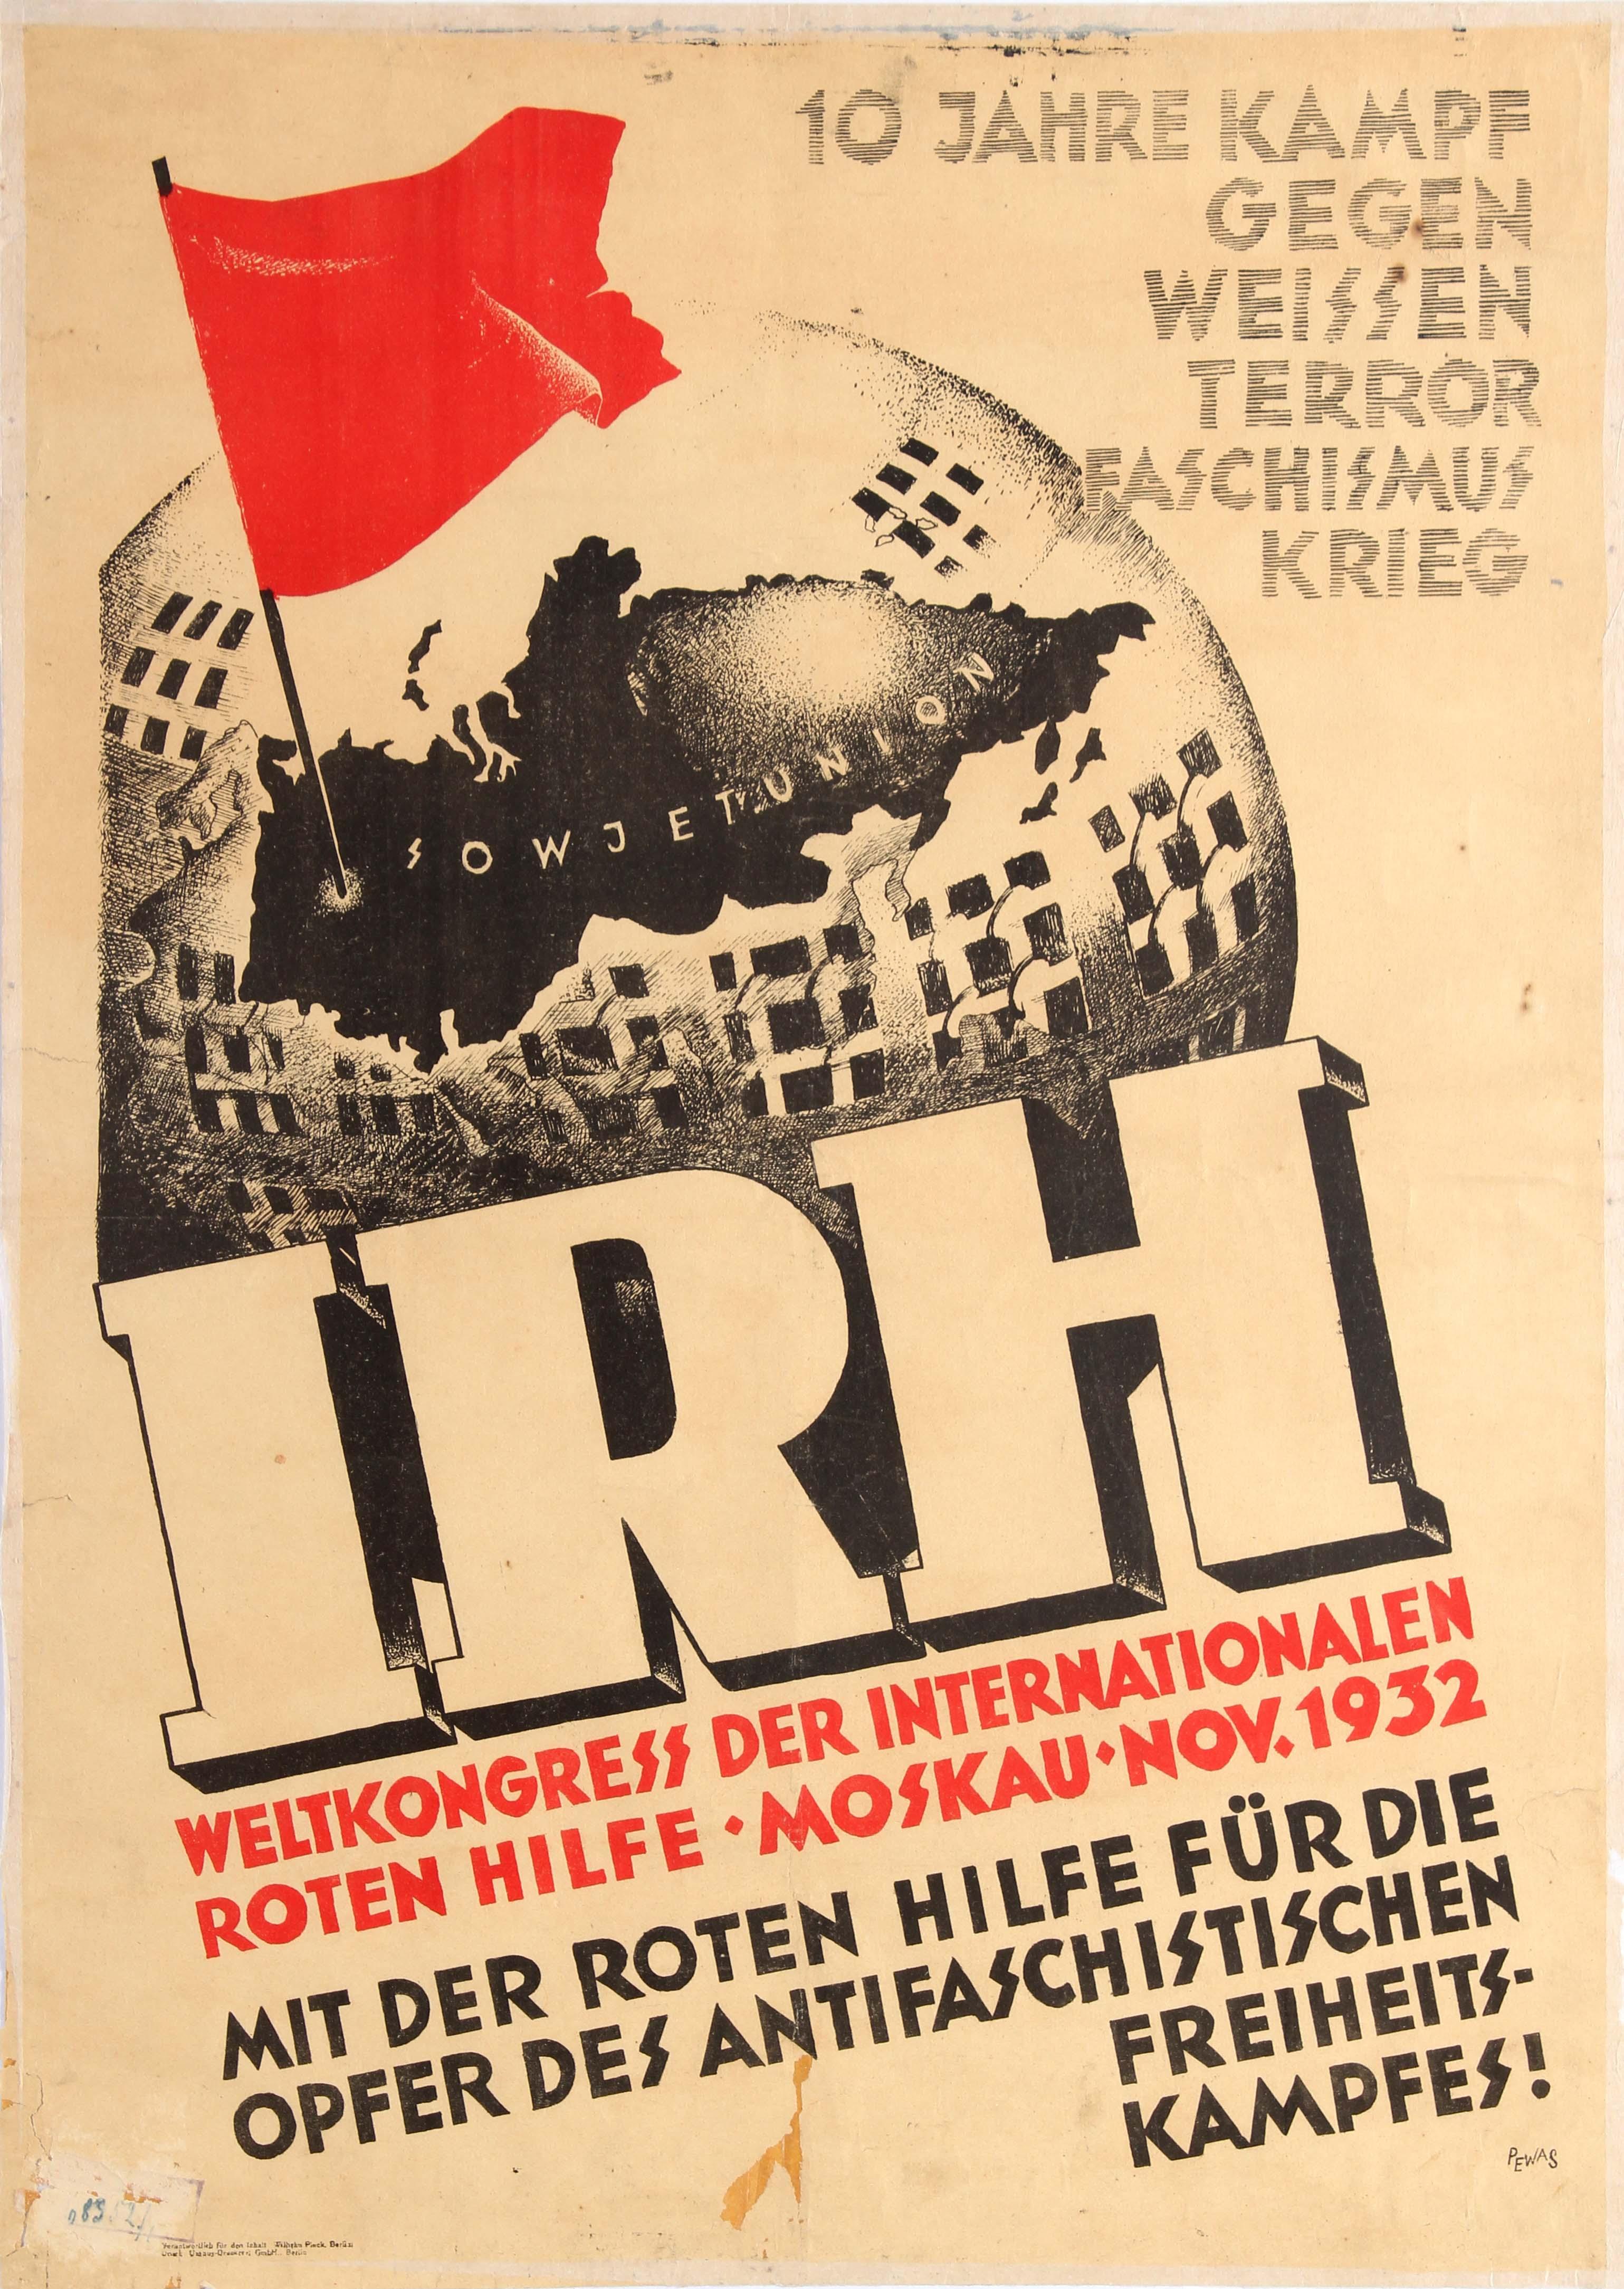 Lot 4301 - Original Propaganda Poster Commuism IRH World Congress Red Aid 1932